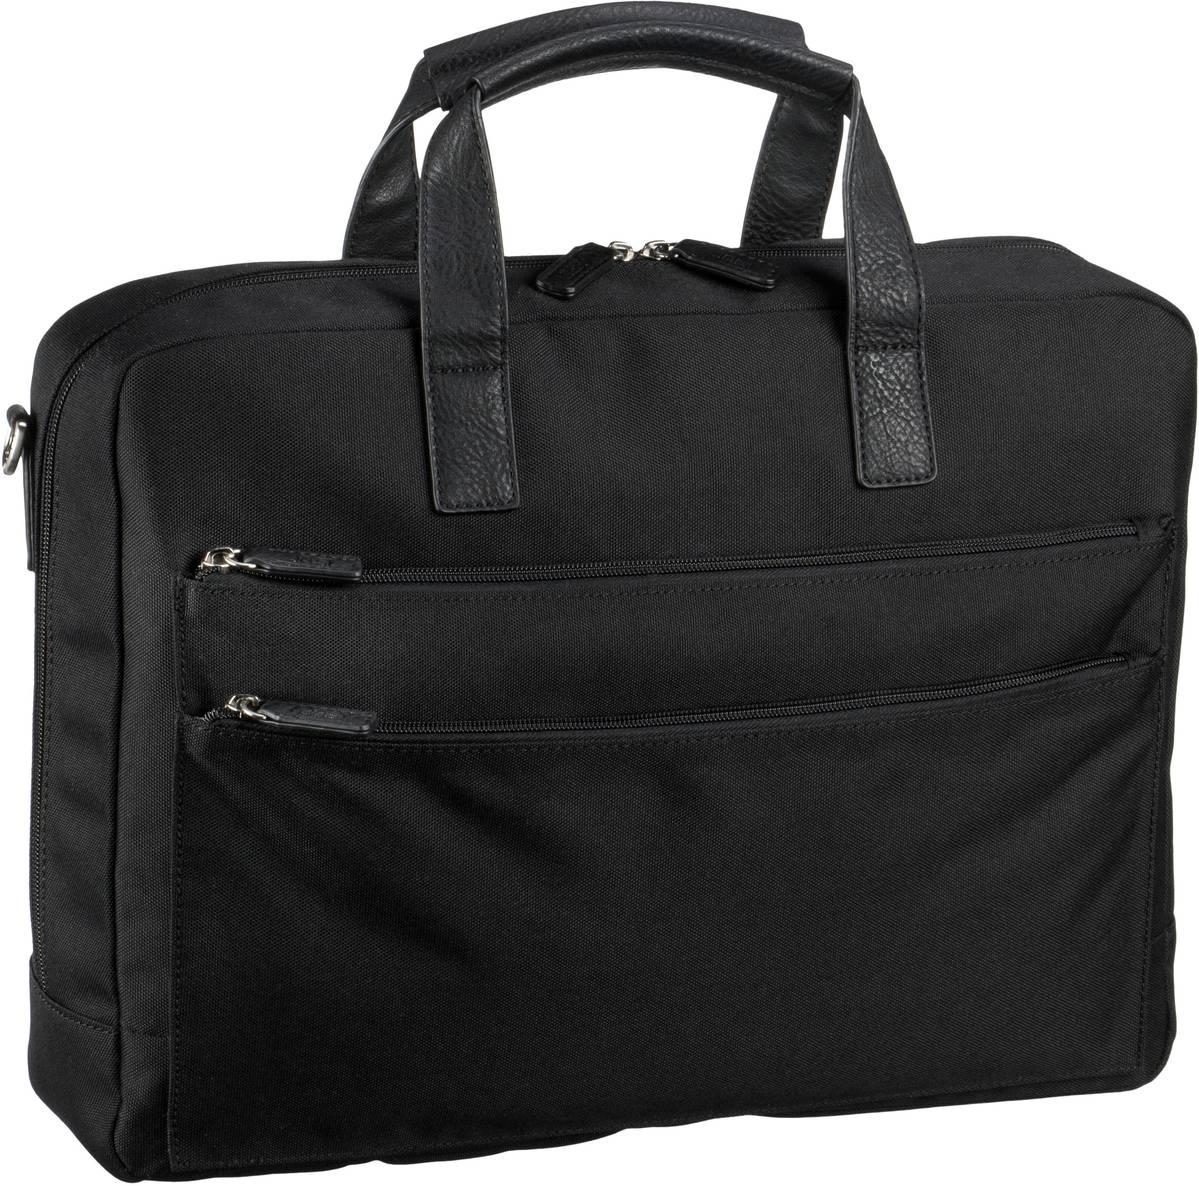 Jost Notebooktasche / Tablet Bergen 1143 Business Bag Schwarz